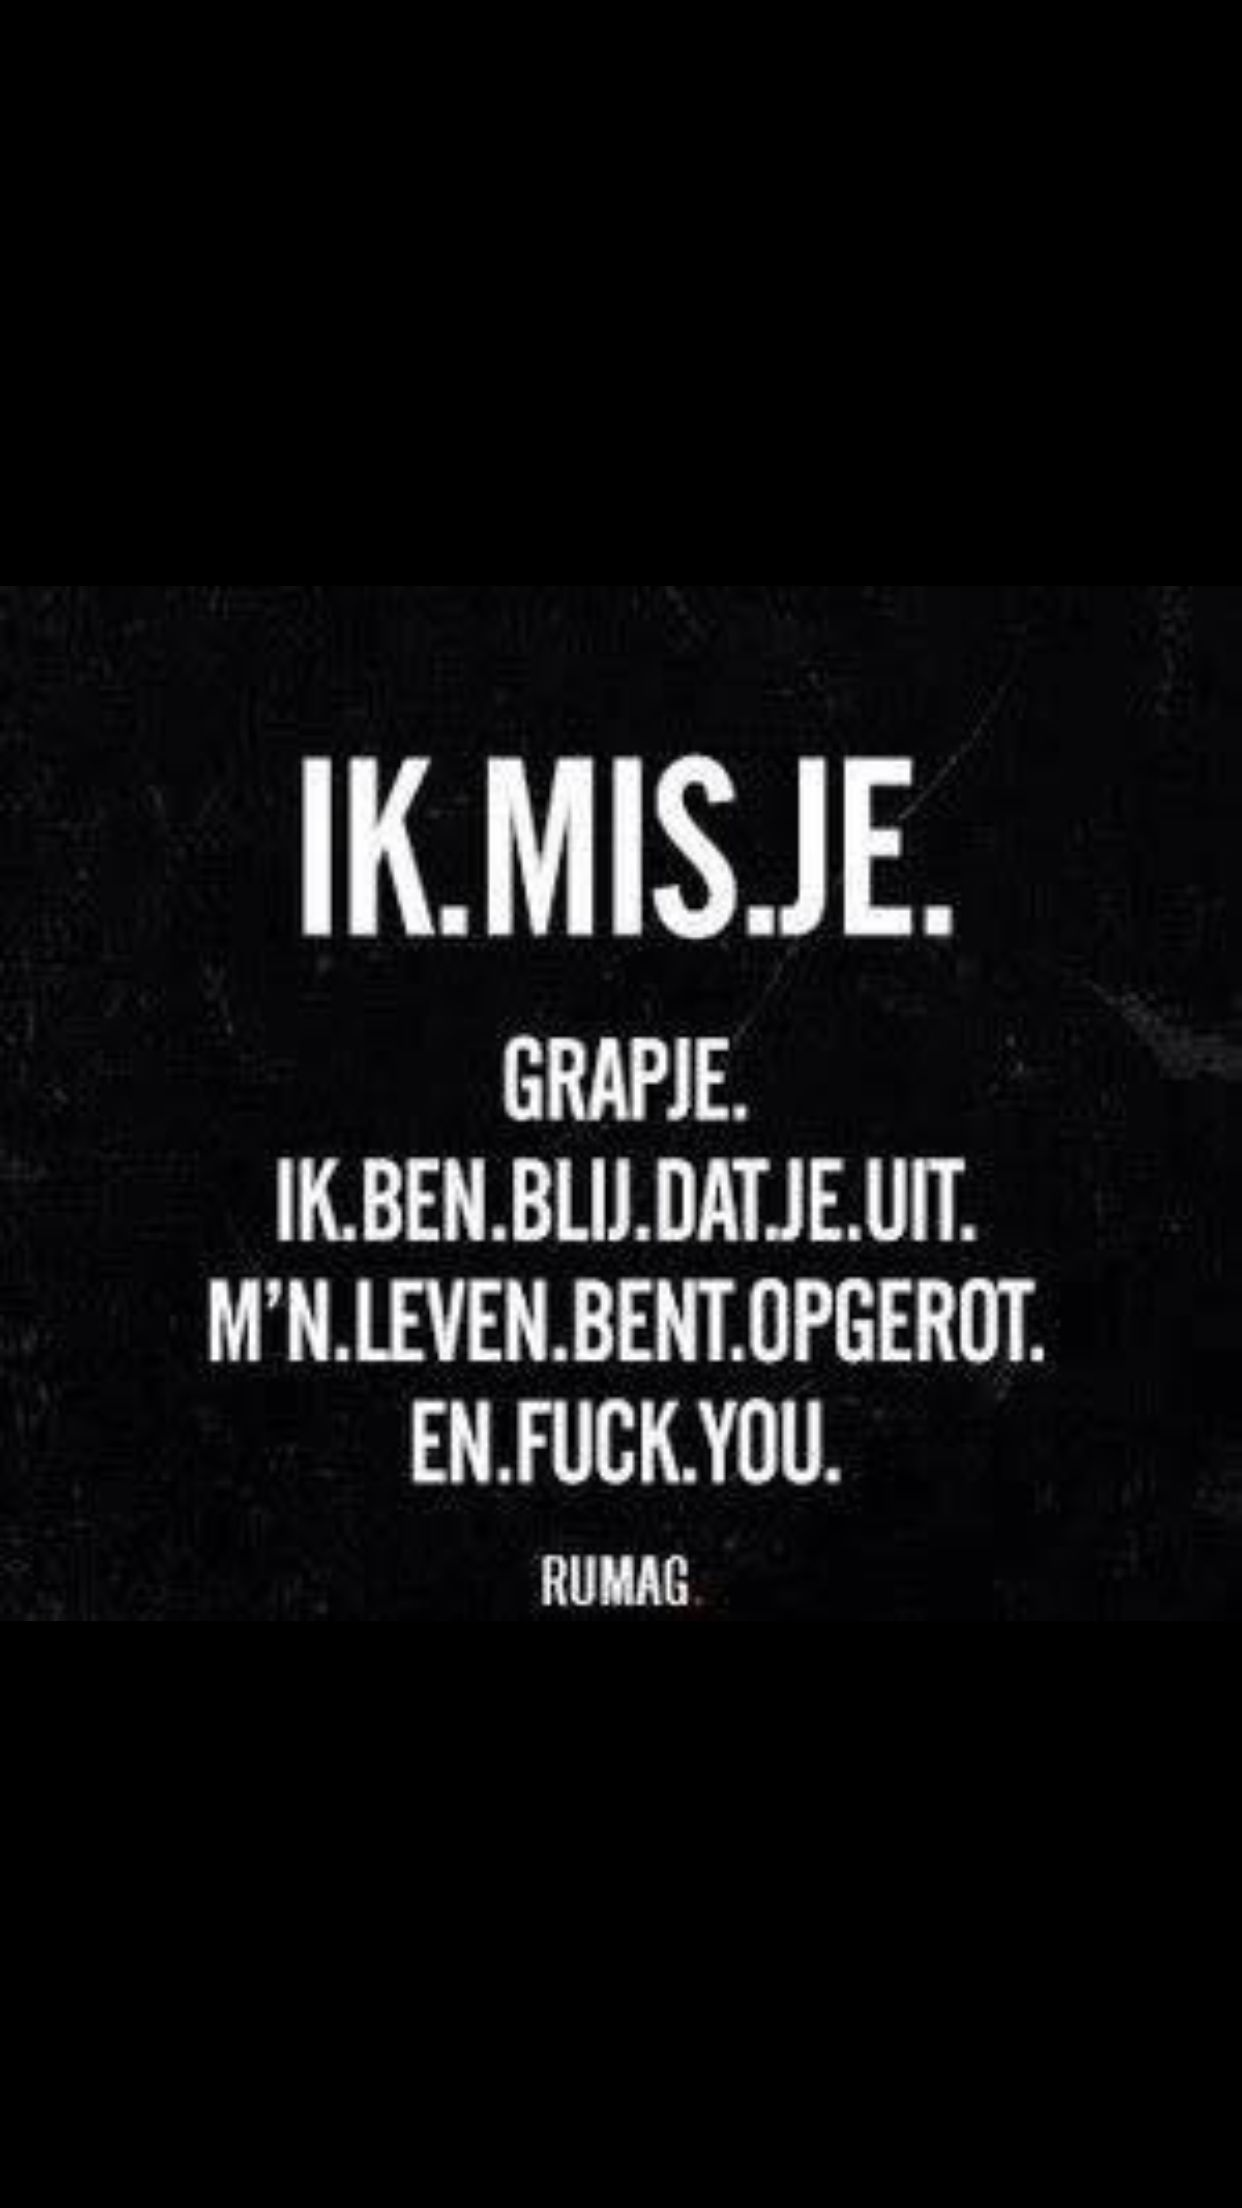 Citaten Nederlands Grappig : Grapje rumag quotes pinterest teksten